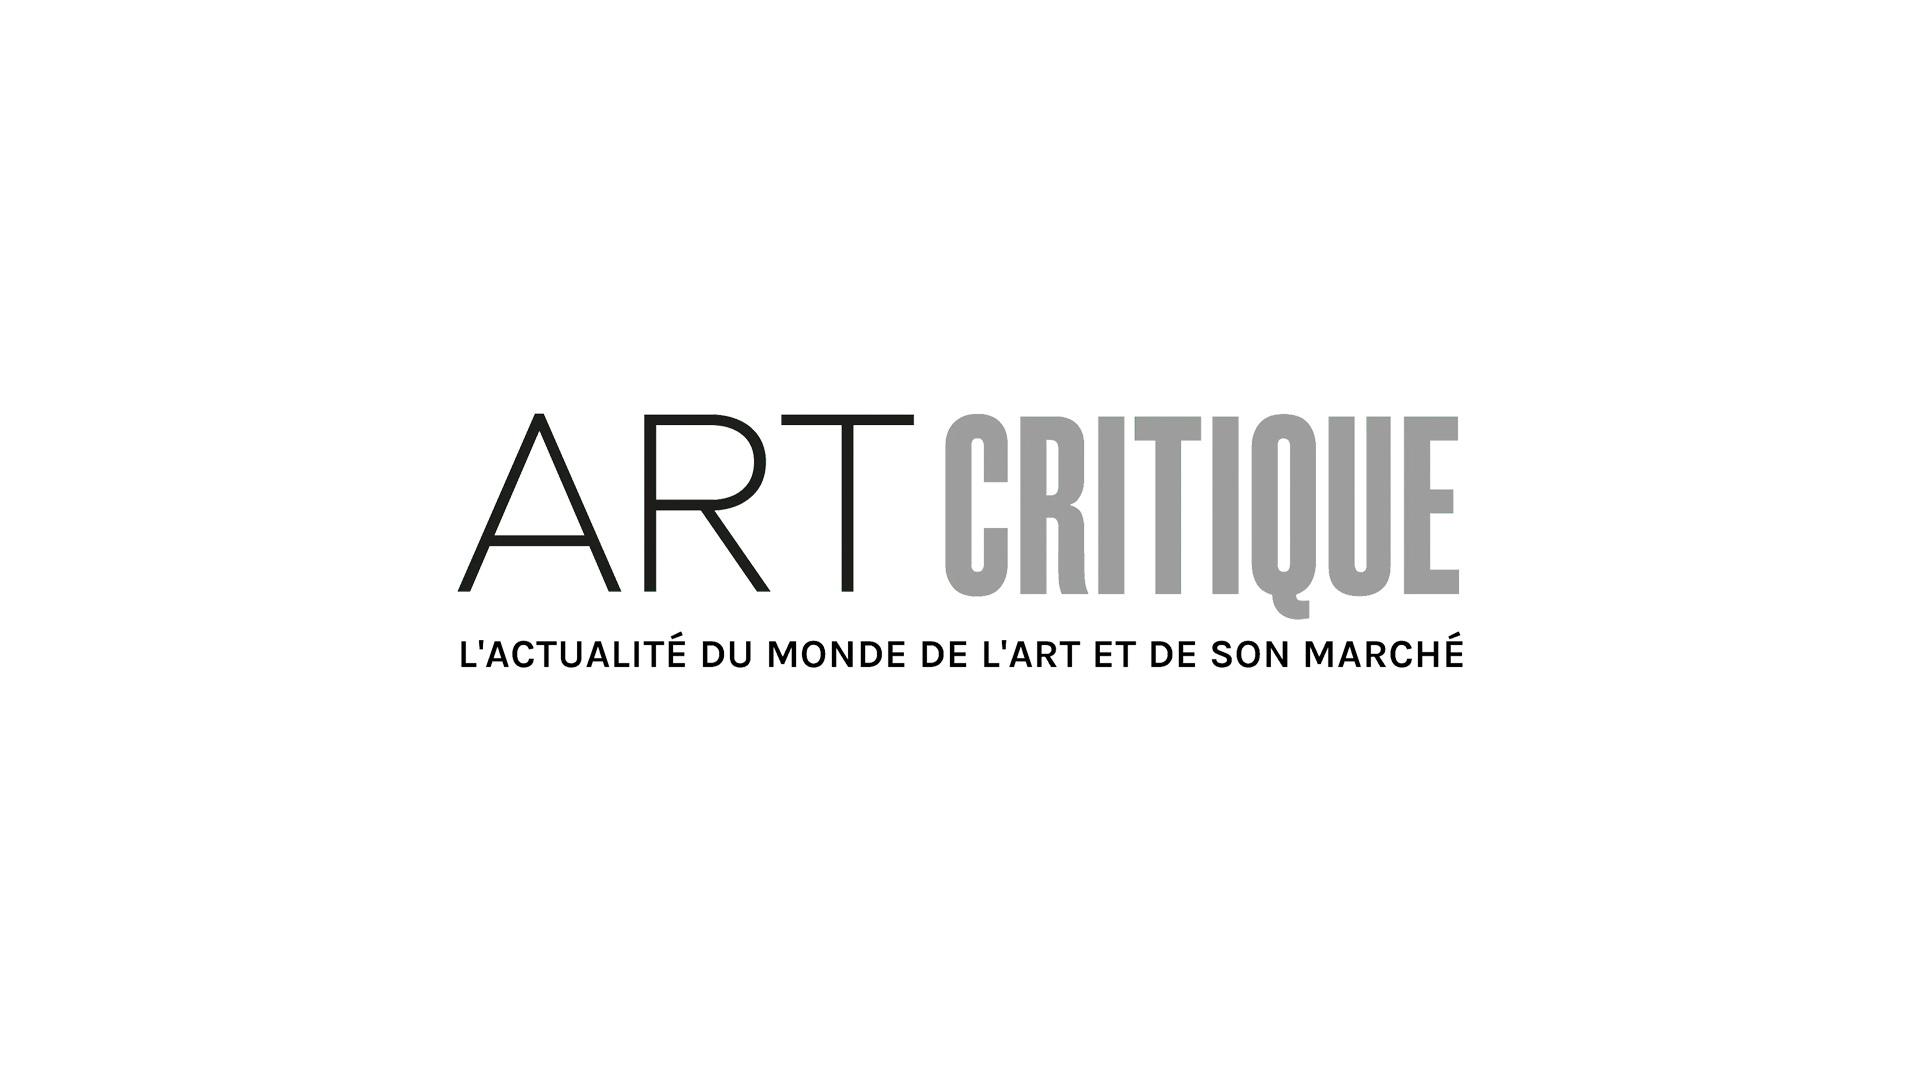 Three women artists pushing ceramics forward